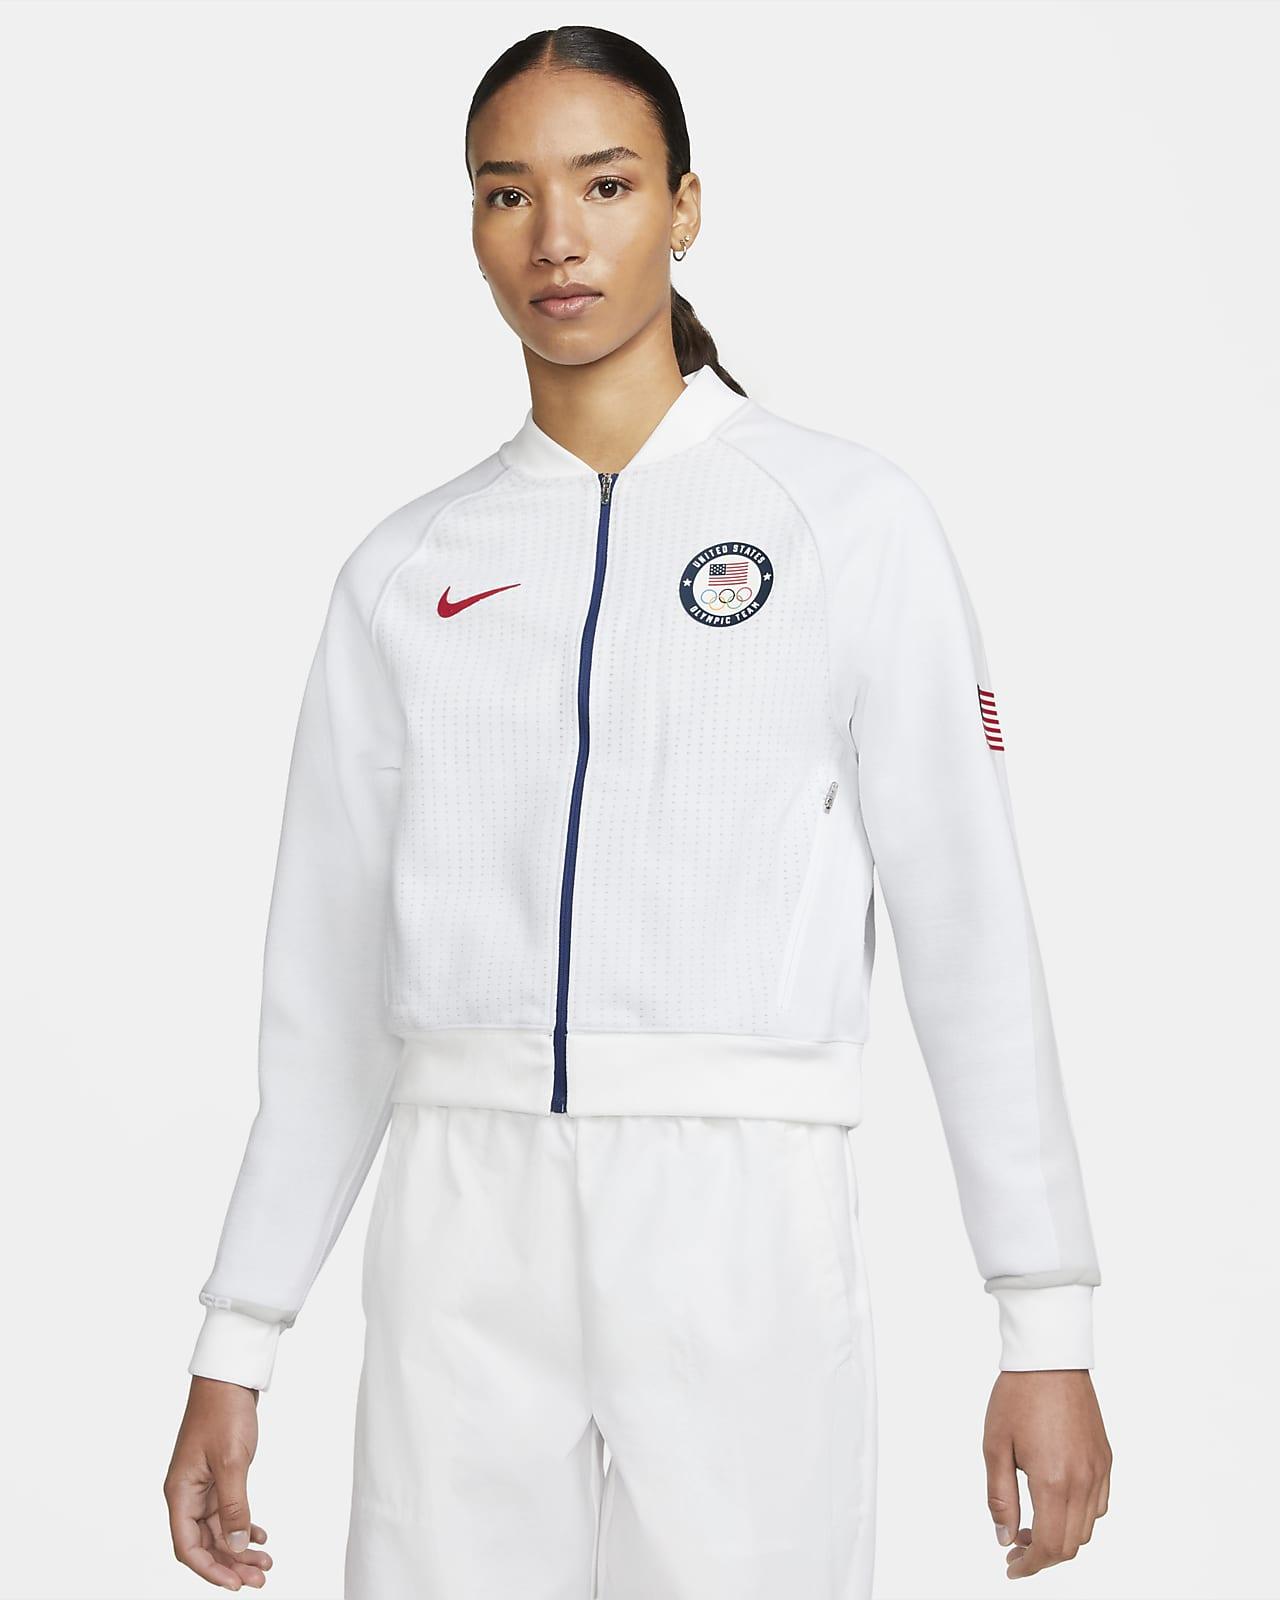 Nike Team USA Women's Jacket